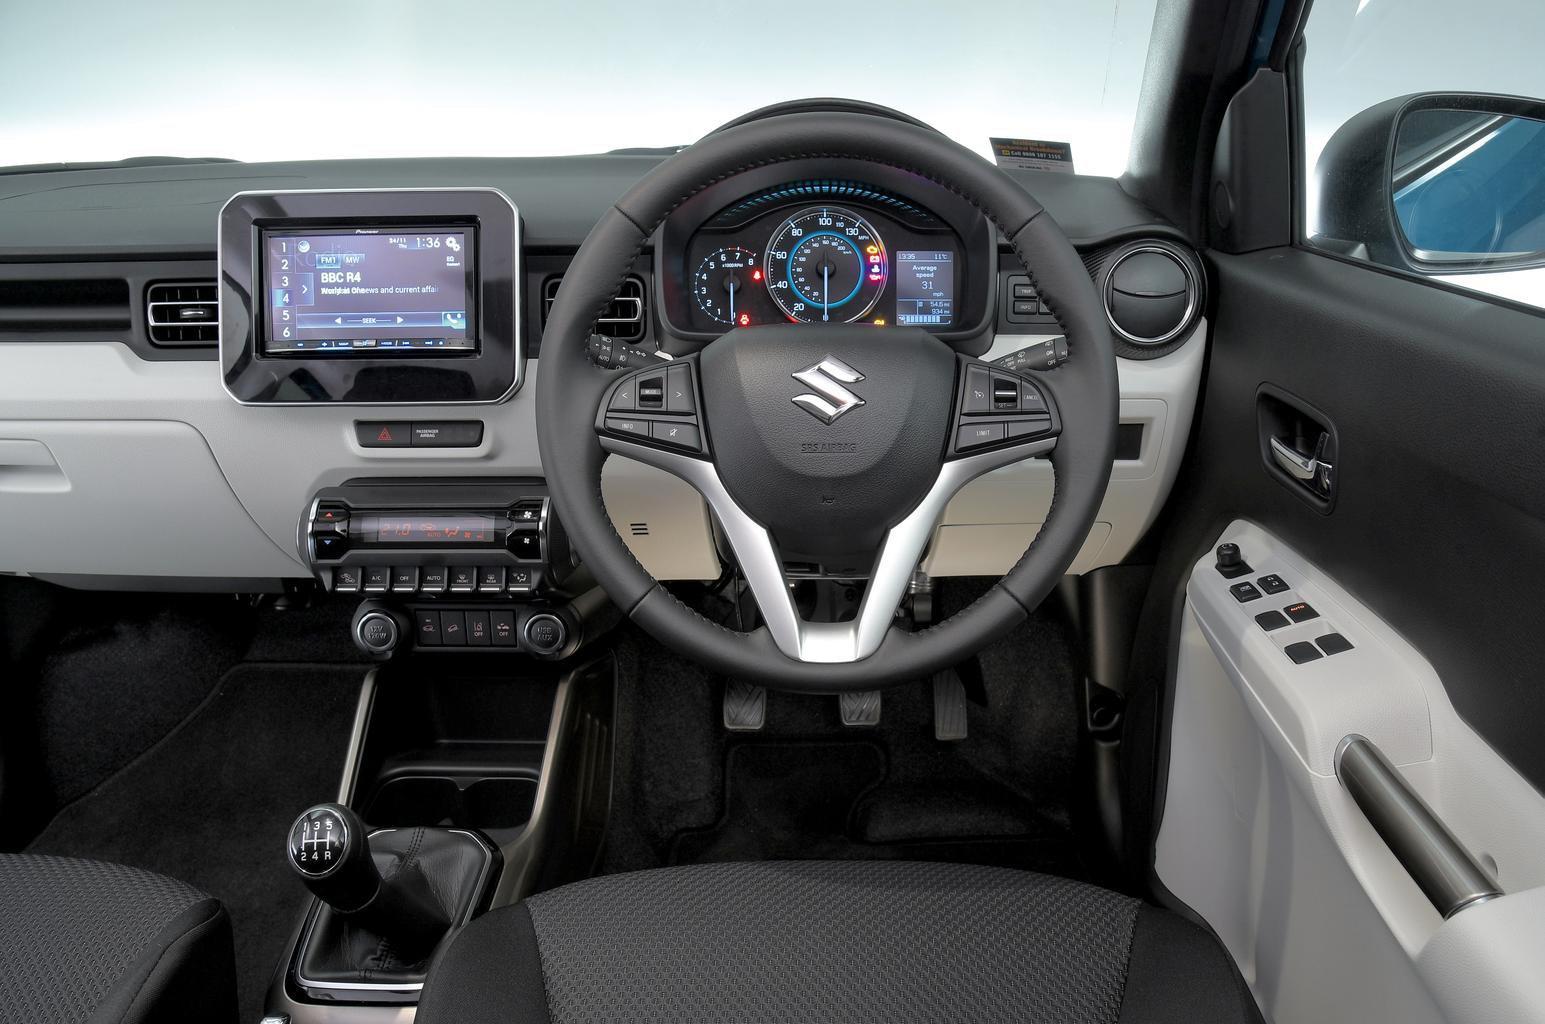 Suzuki Ignis 1.2 Dualjet SHVS SZ5 - interior